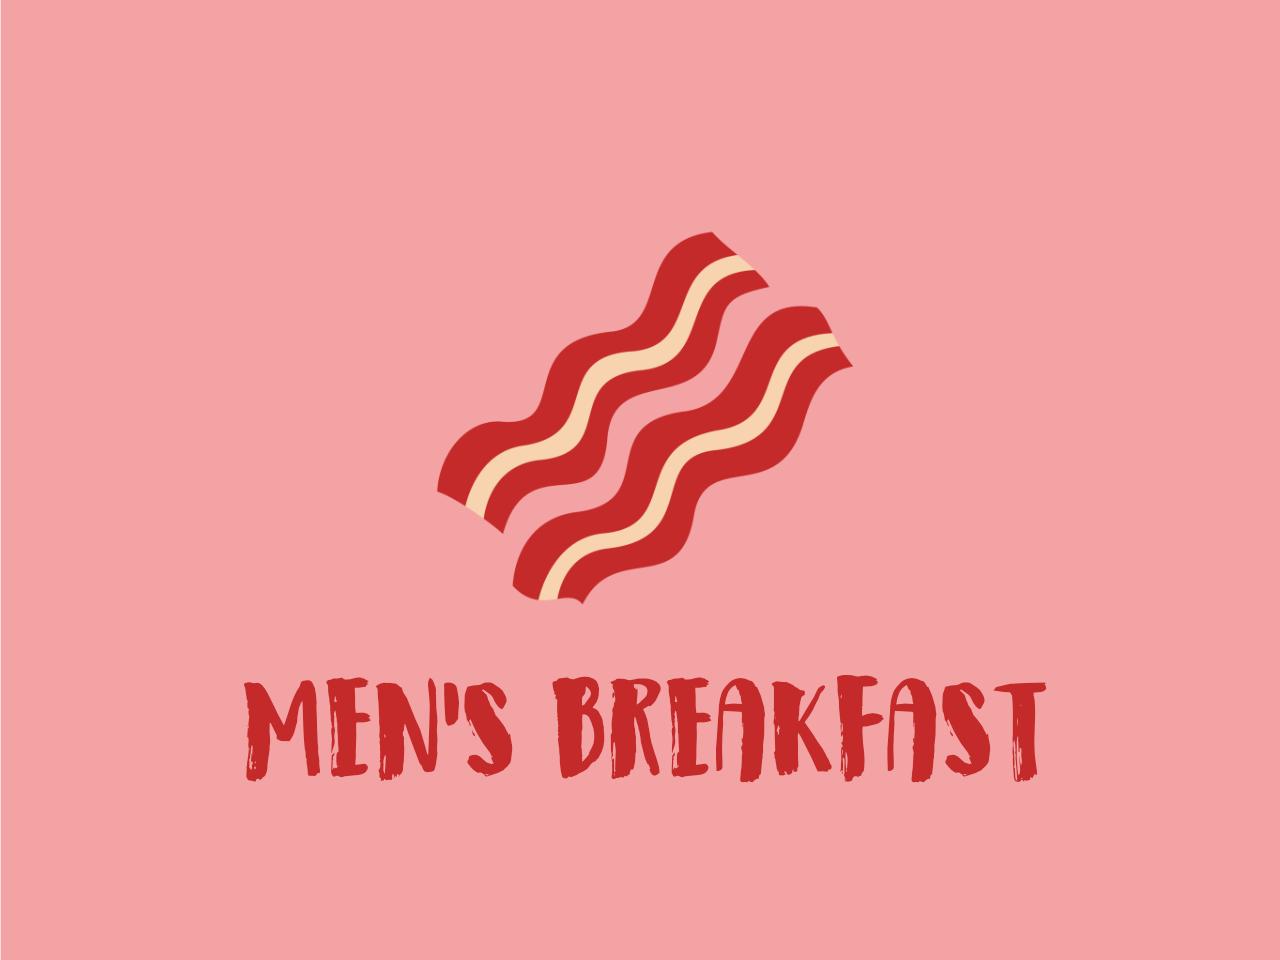 Men's breakfast logo.png